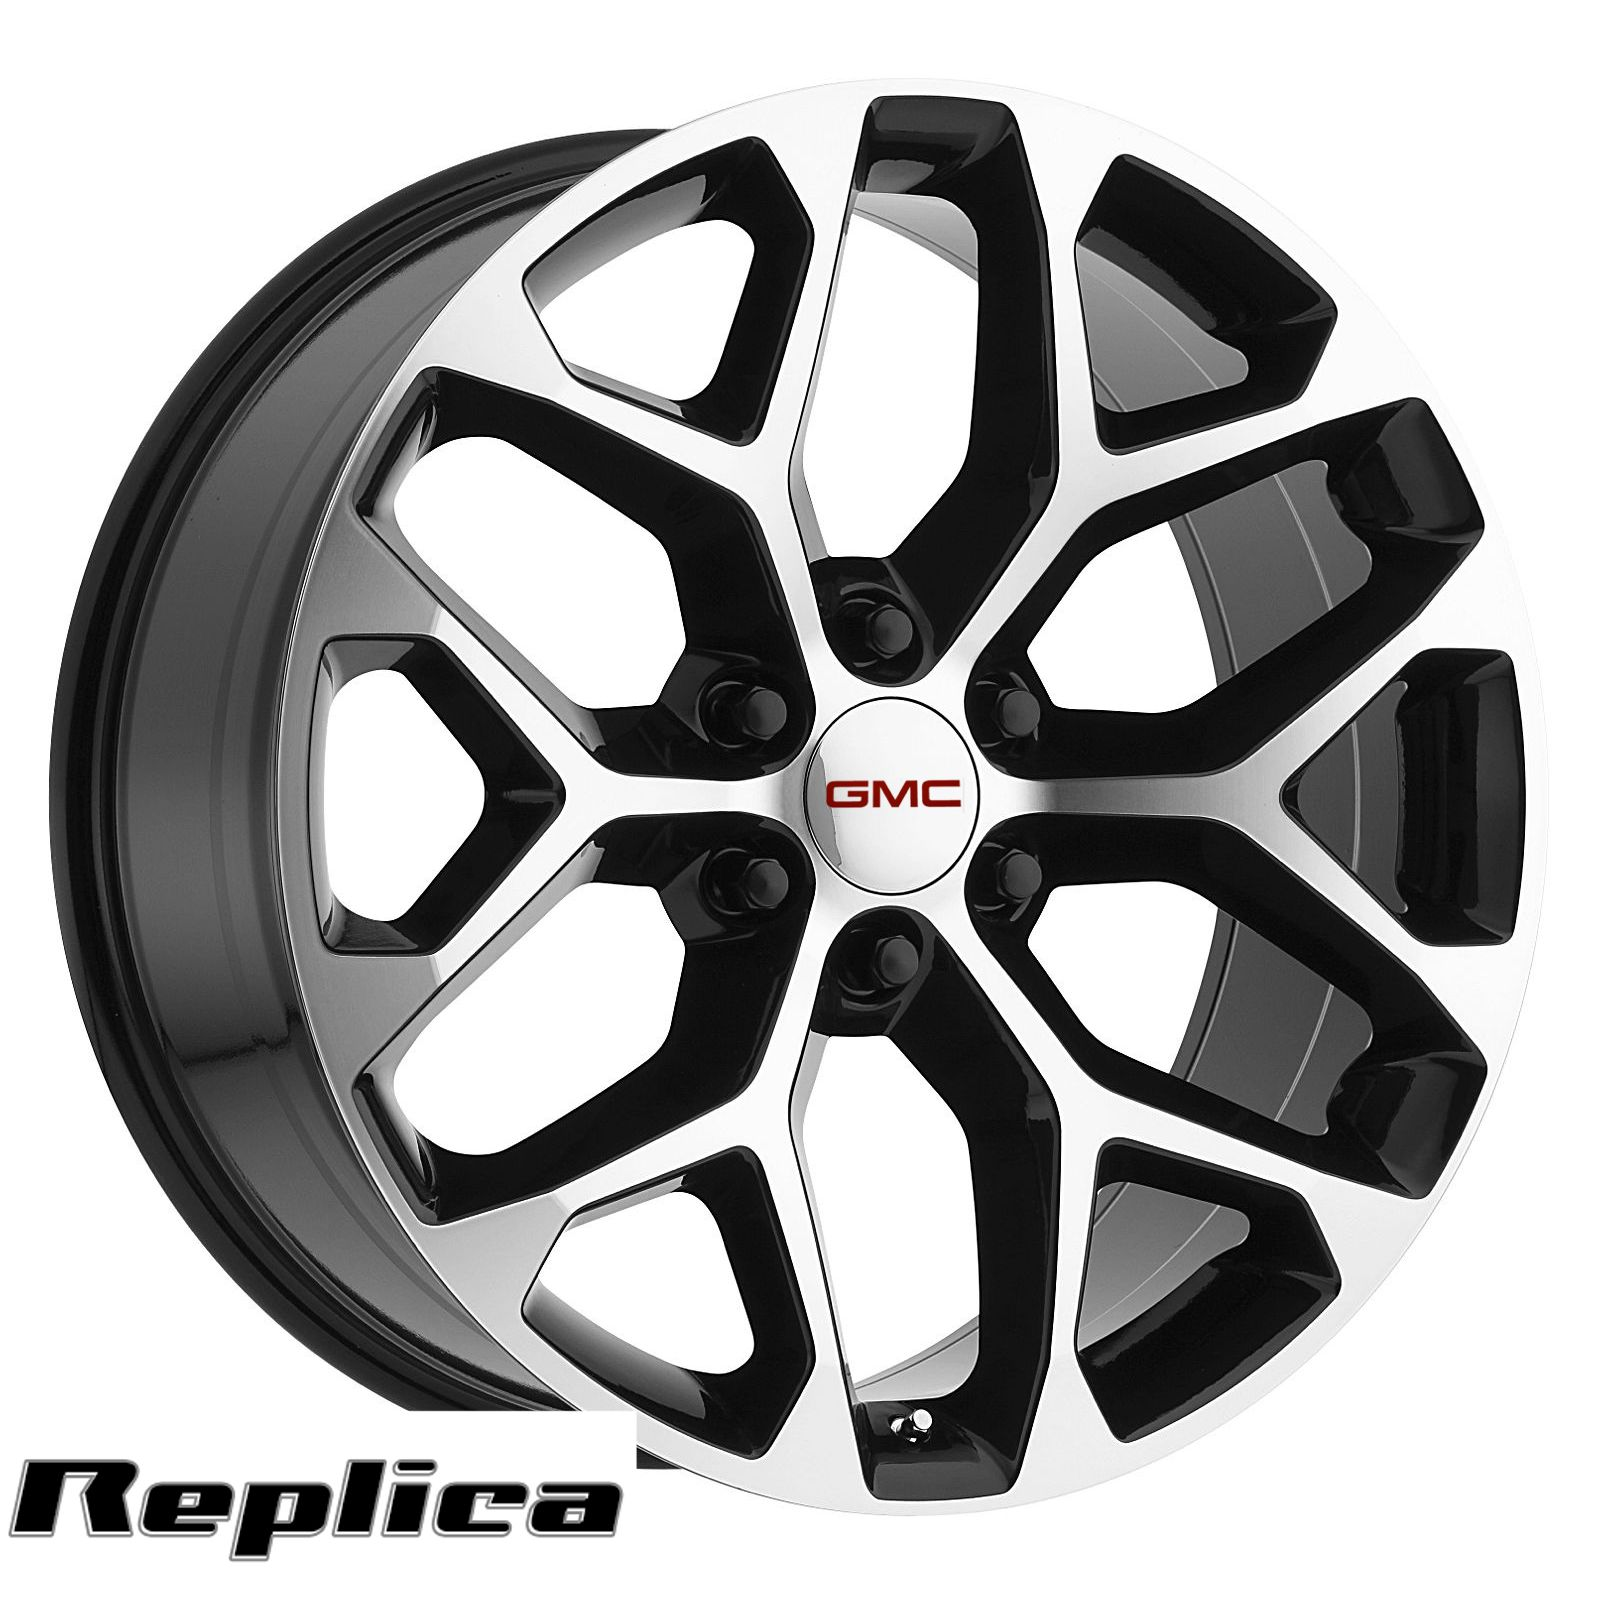 50 Inch Rims On Chevy : Gmc sierra wheels inch quot black machined rims